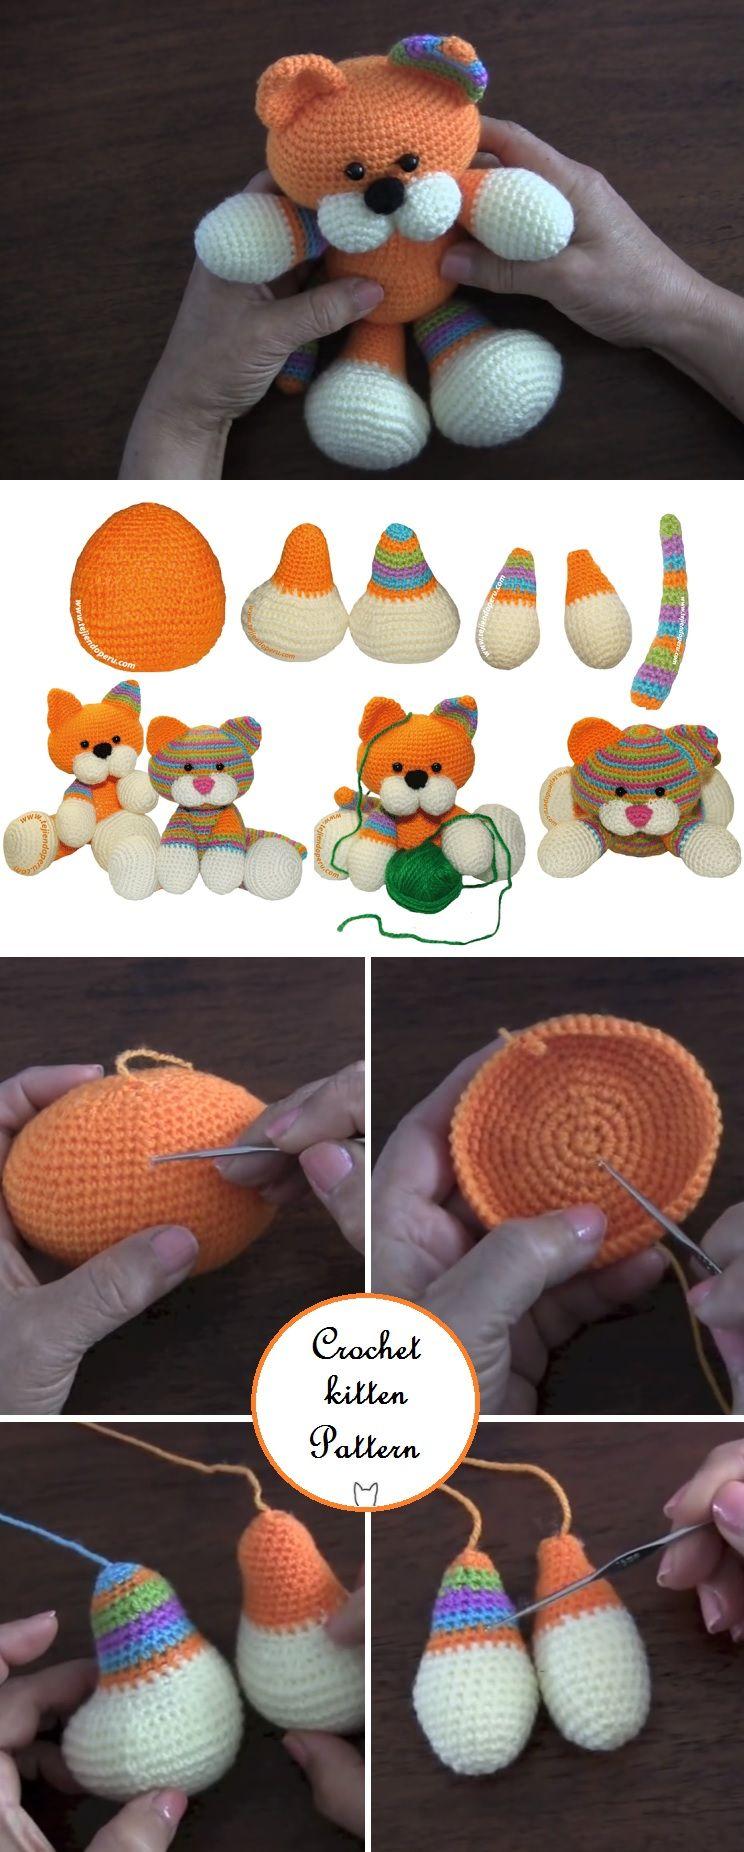 Crochet Cute Kitten - Pattern | Animales tejidos, Patrones amigurumi ...